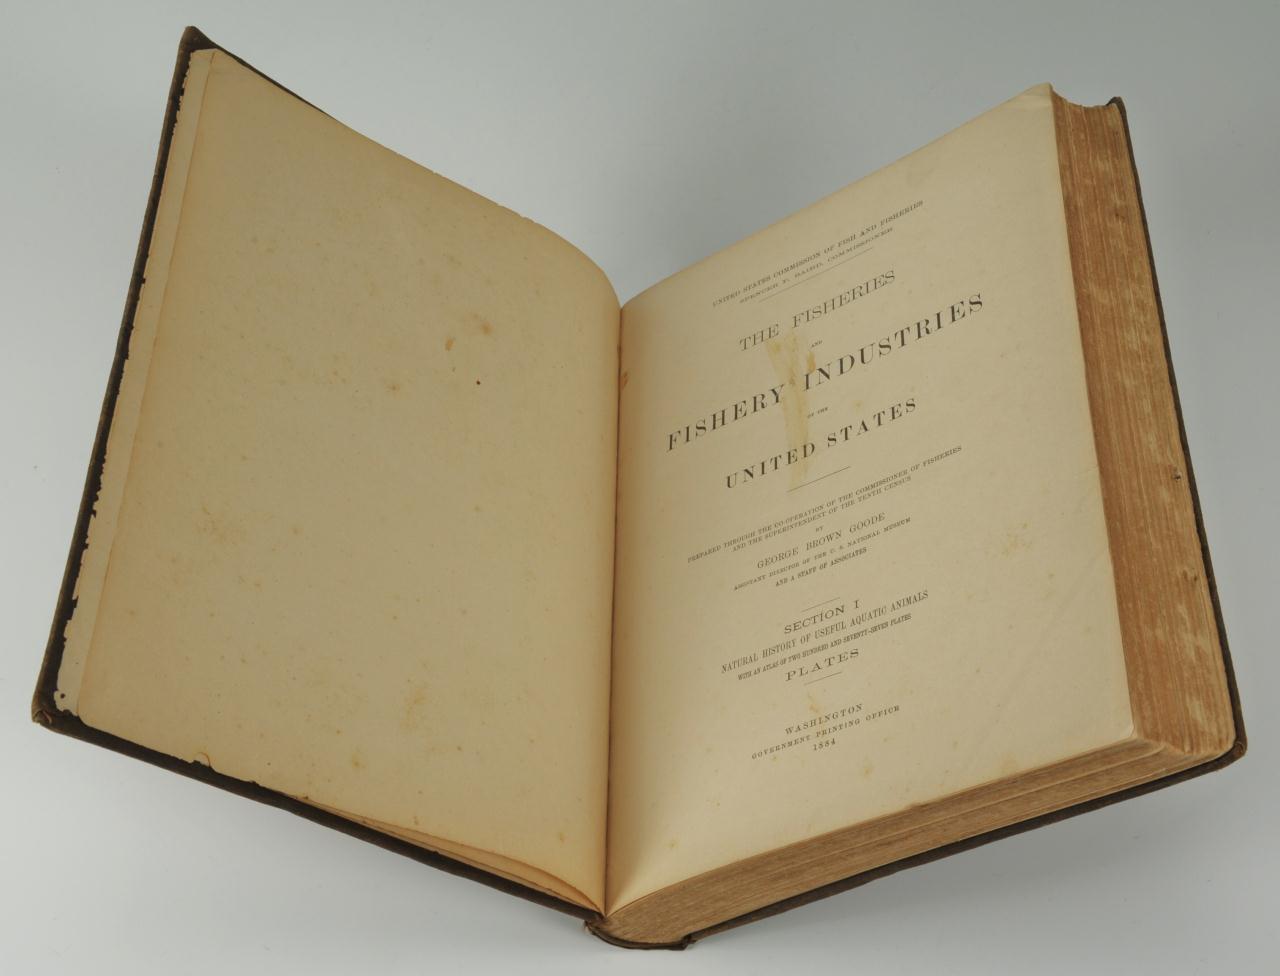 Lot 160: Rare book on American Fish, 277 plates